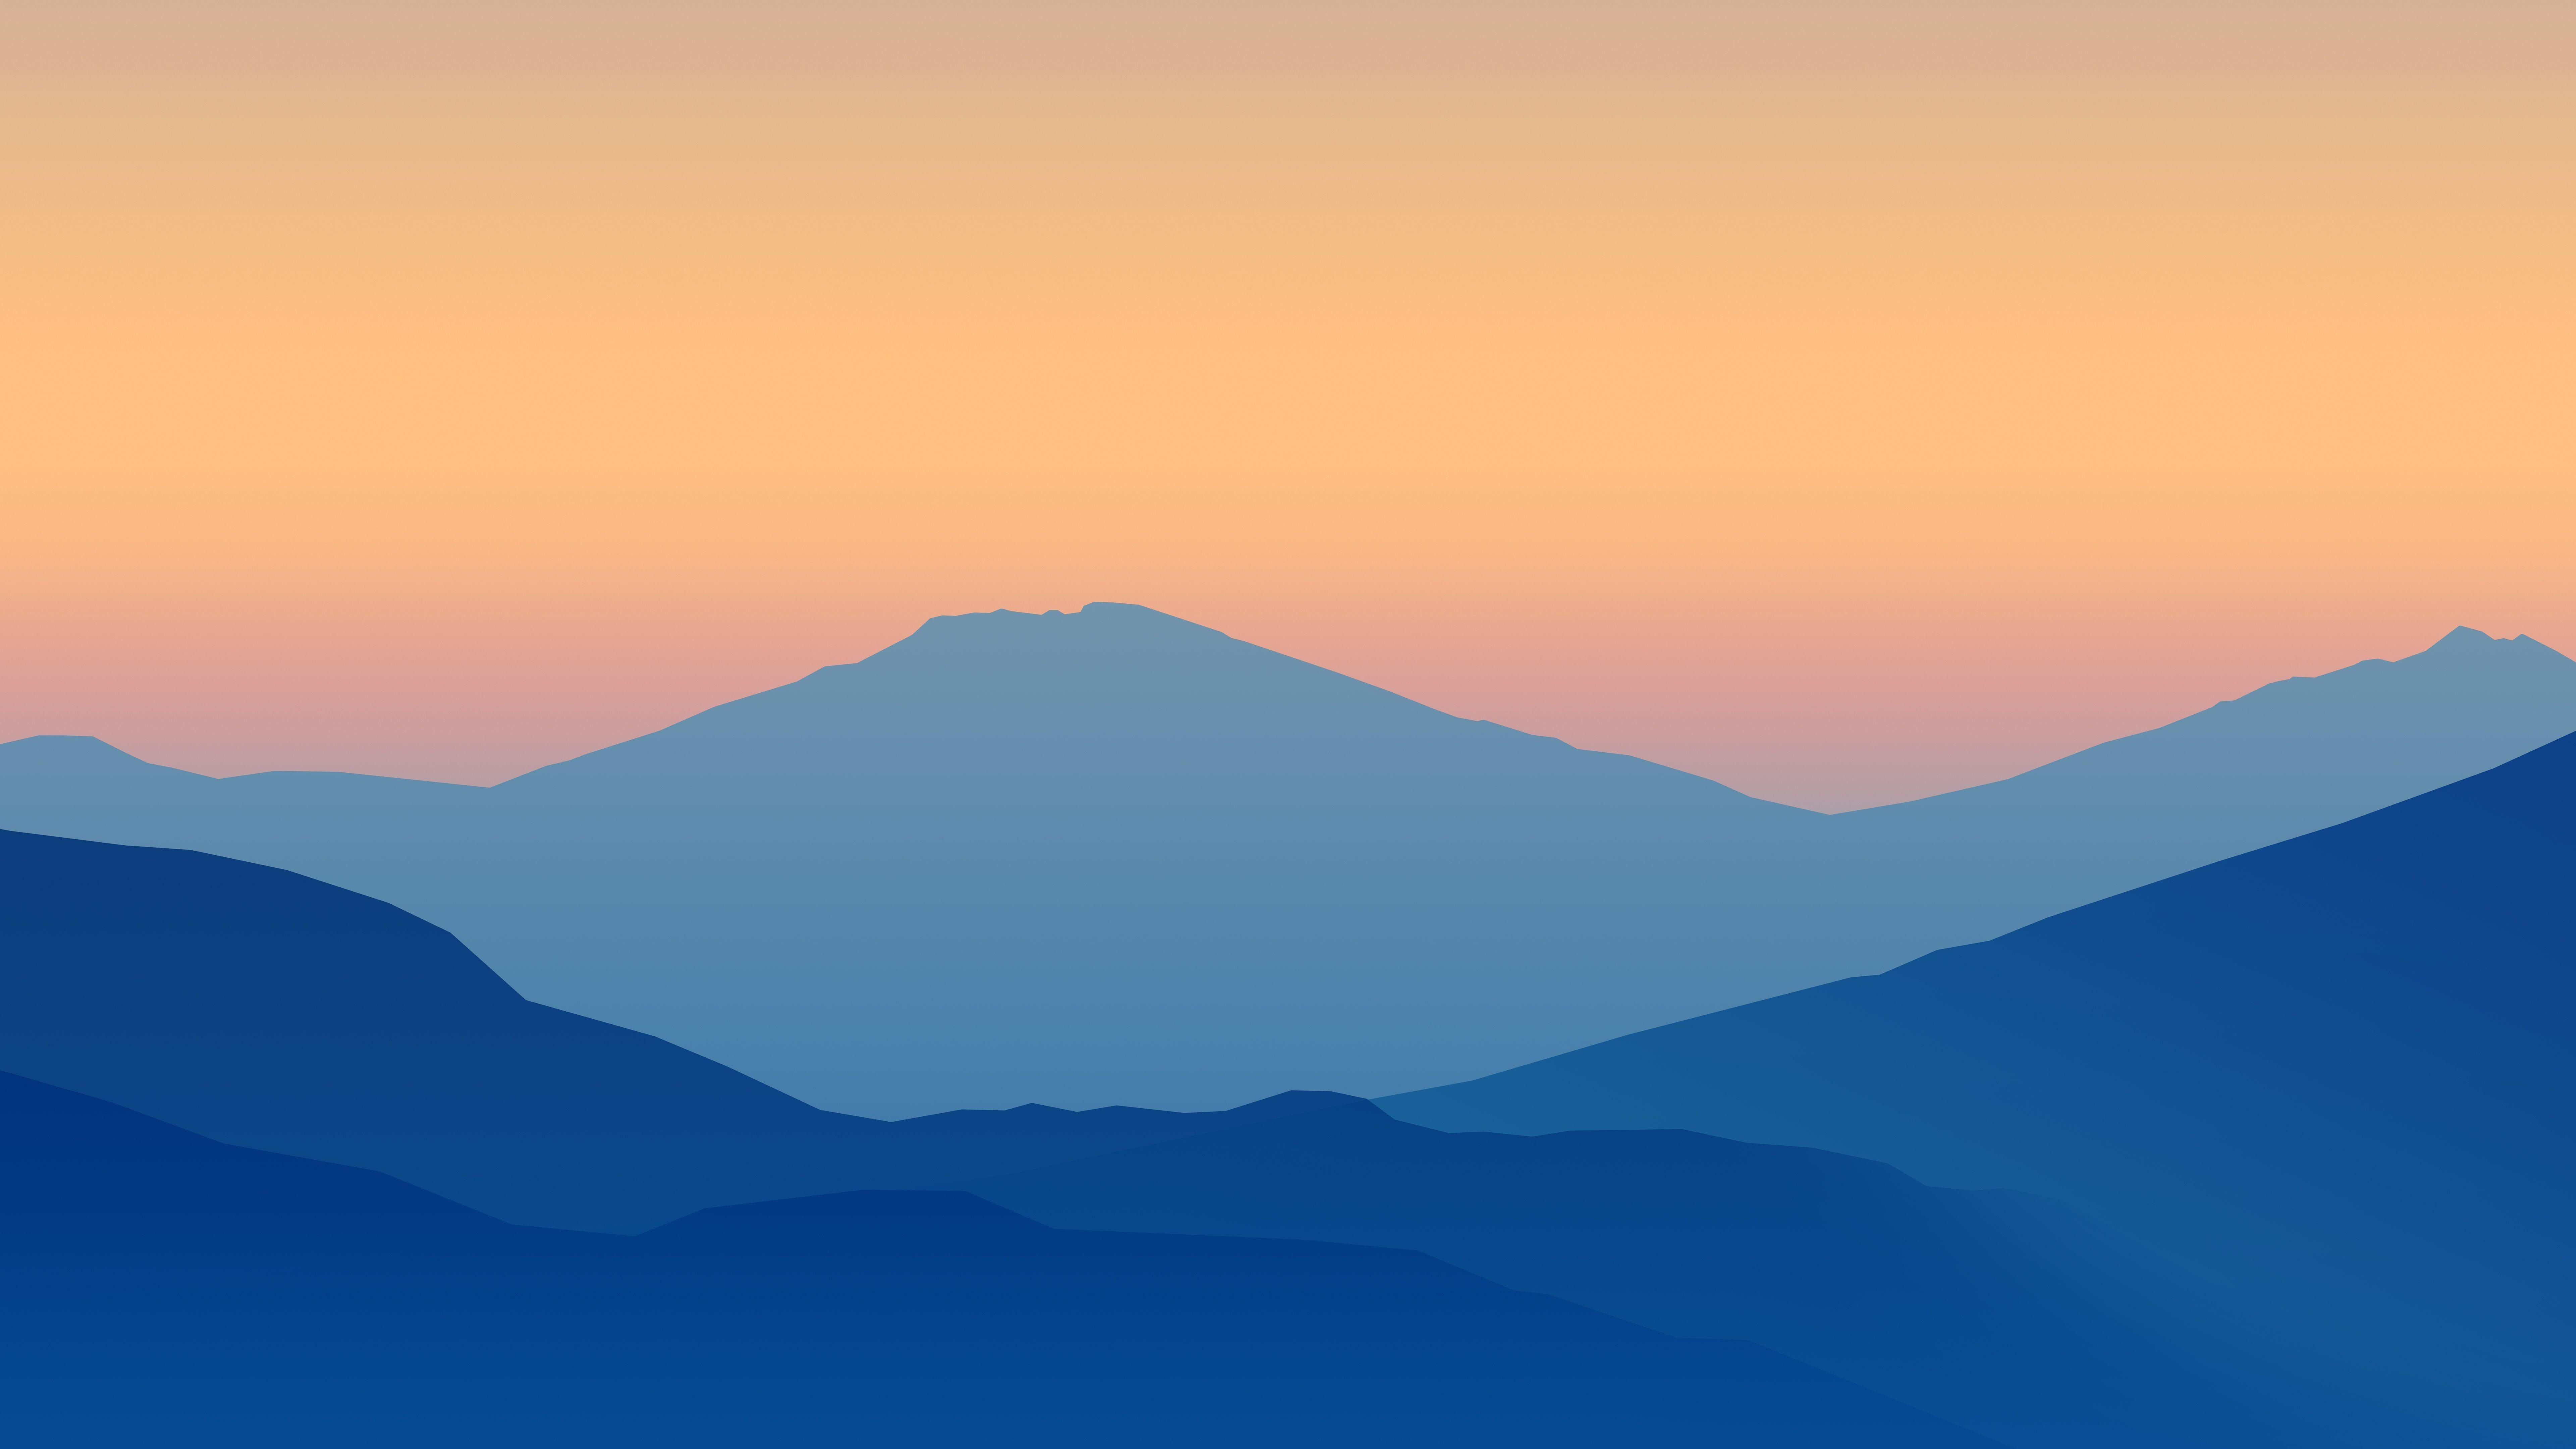 Blue mountains silhouettes wallpaper